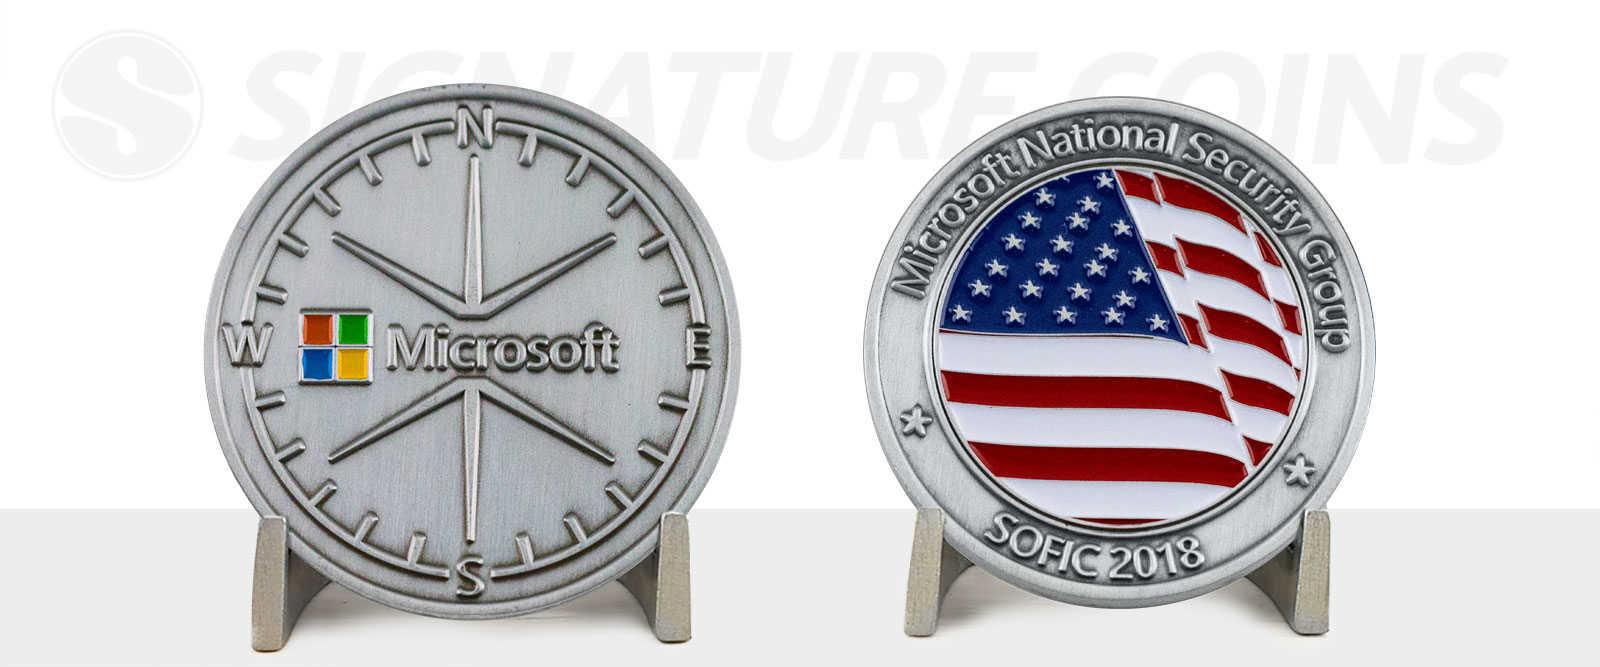 custom-coin-company-signature-coins-5